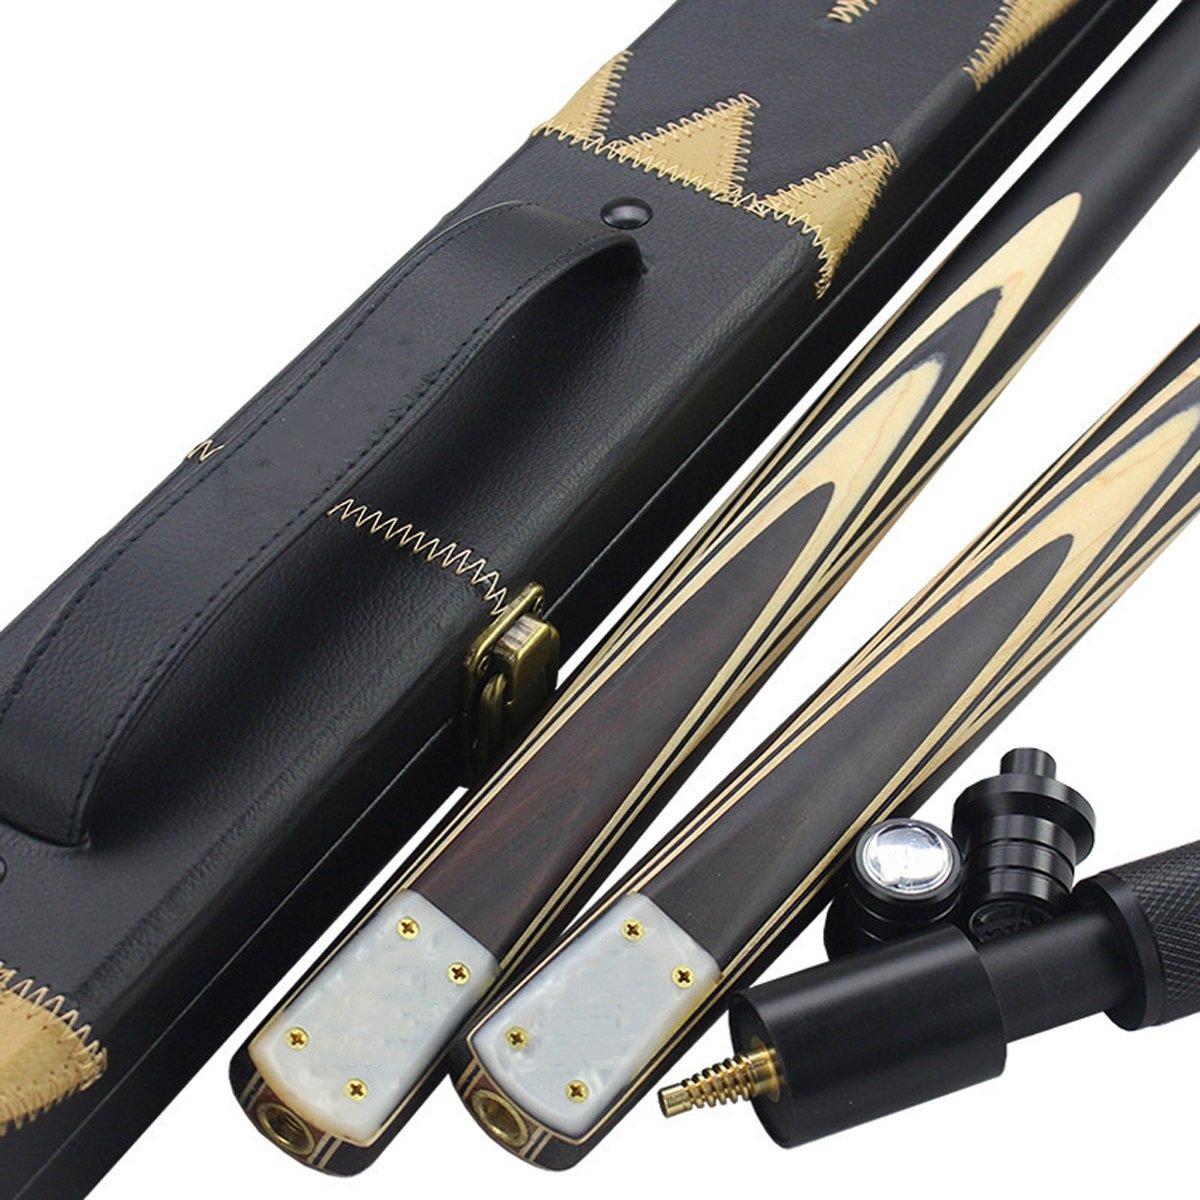 LIAN Billard Club Petite Tête Style Chinois Noir Huit Billard Britannique Set Table Pole (145cm/57.1in Emballage DE 1)